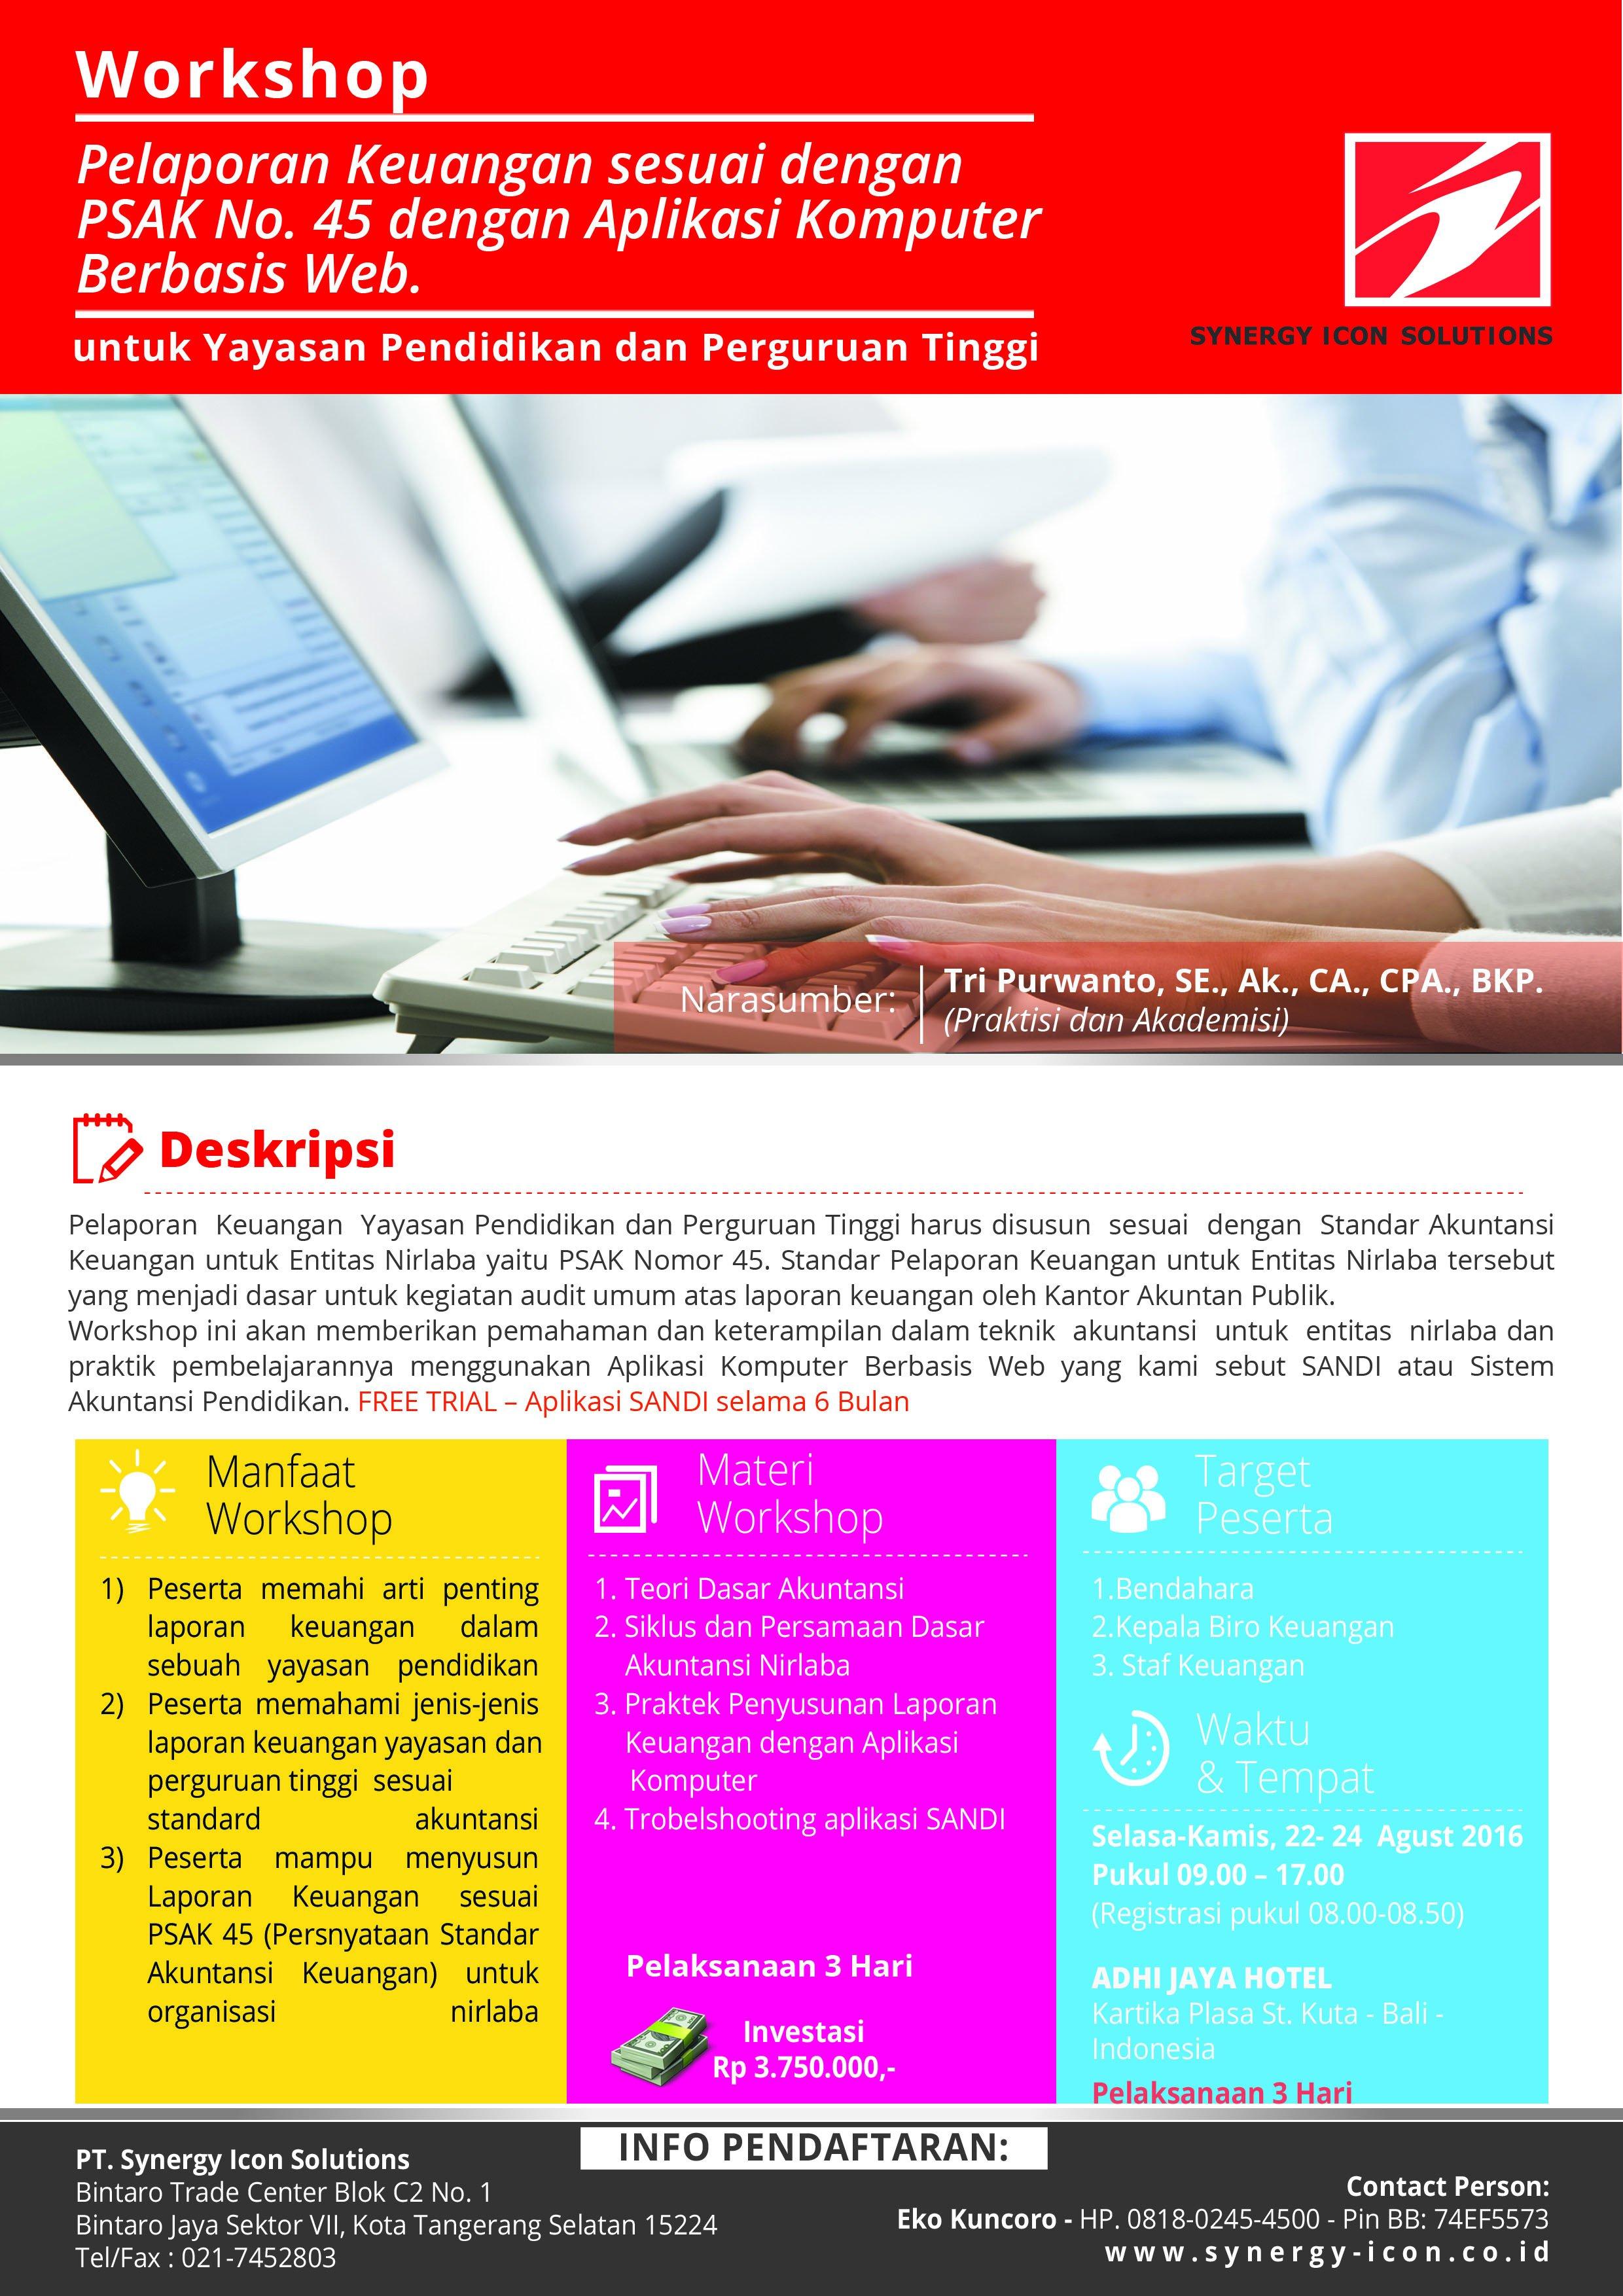 Workshop Penyusunan Laporan Keuangan berbasis Web